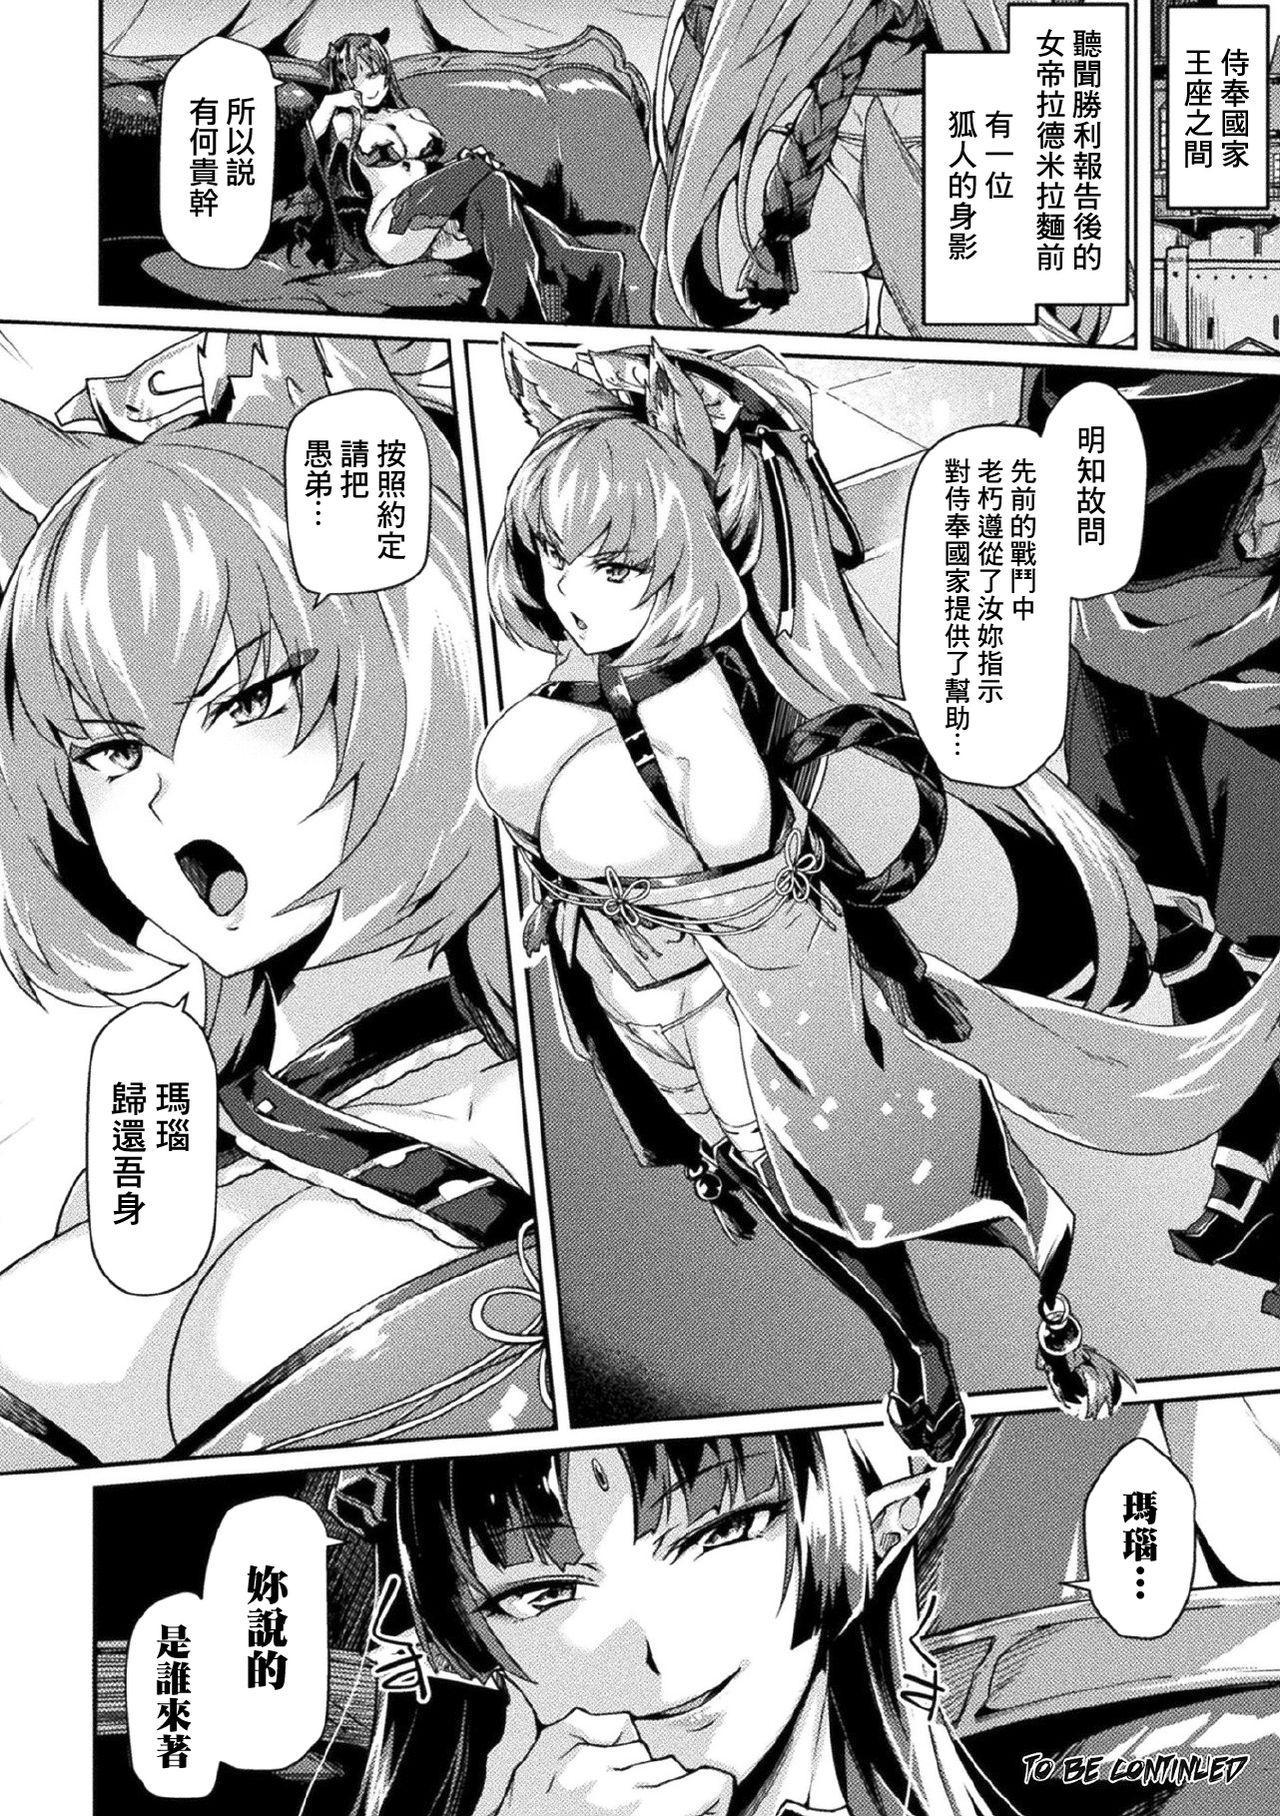 [Tsukitokage] Kuroinu II ~Inyoku ni Somaru Haitoku no Miyako, Futatabi~ THE COMIC Ch. 4 (Kukkoro Heroines Vol. 3) [Chinese] [鬼畜王漢化組] [Digital] 22